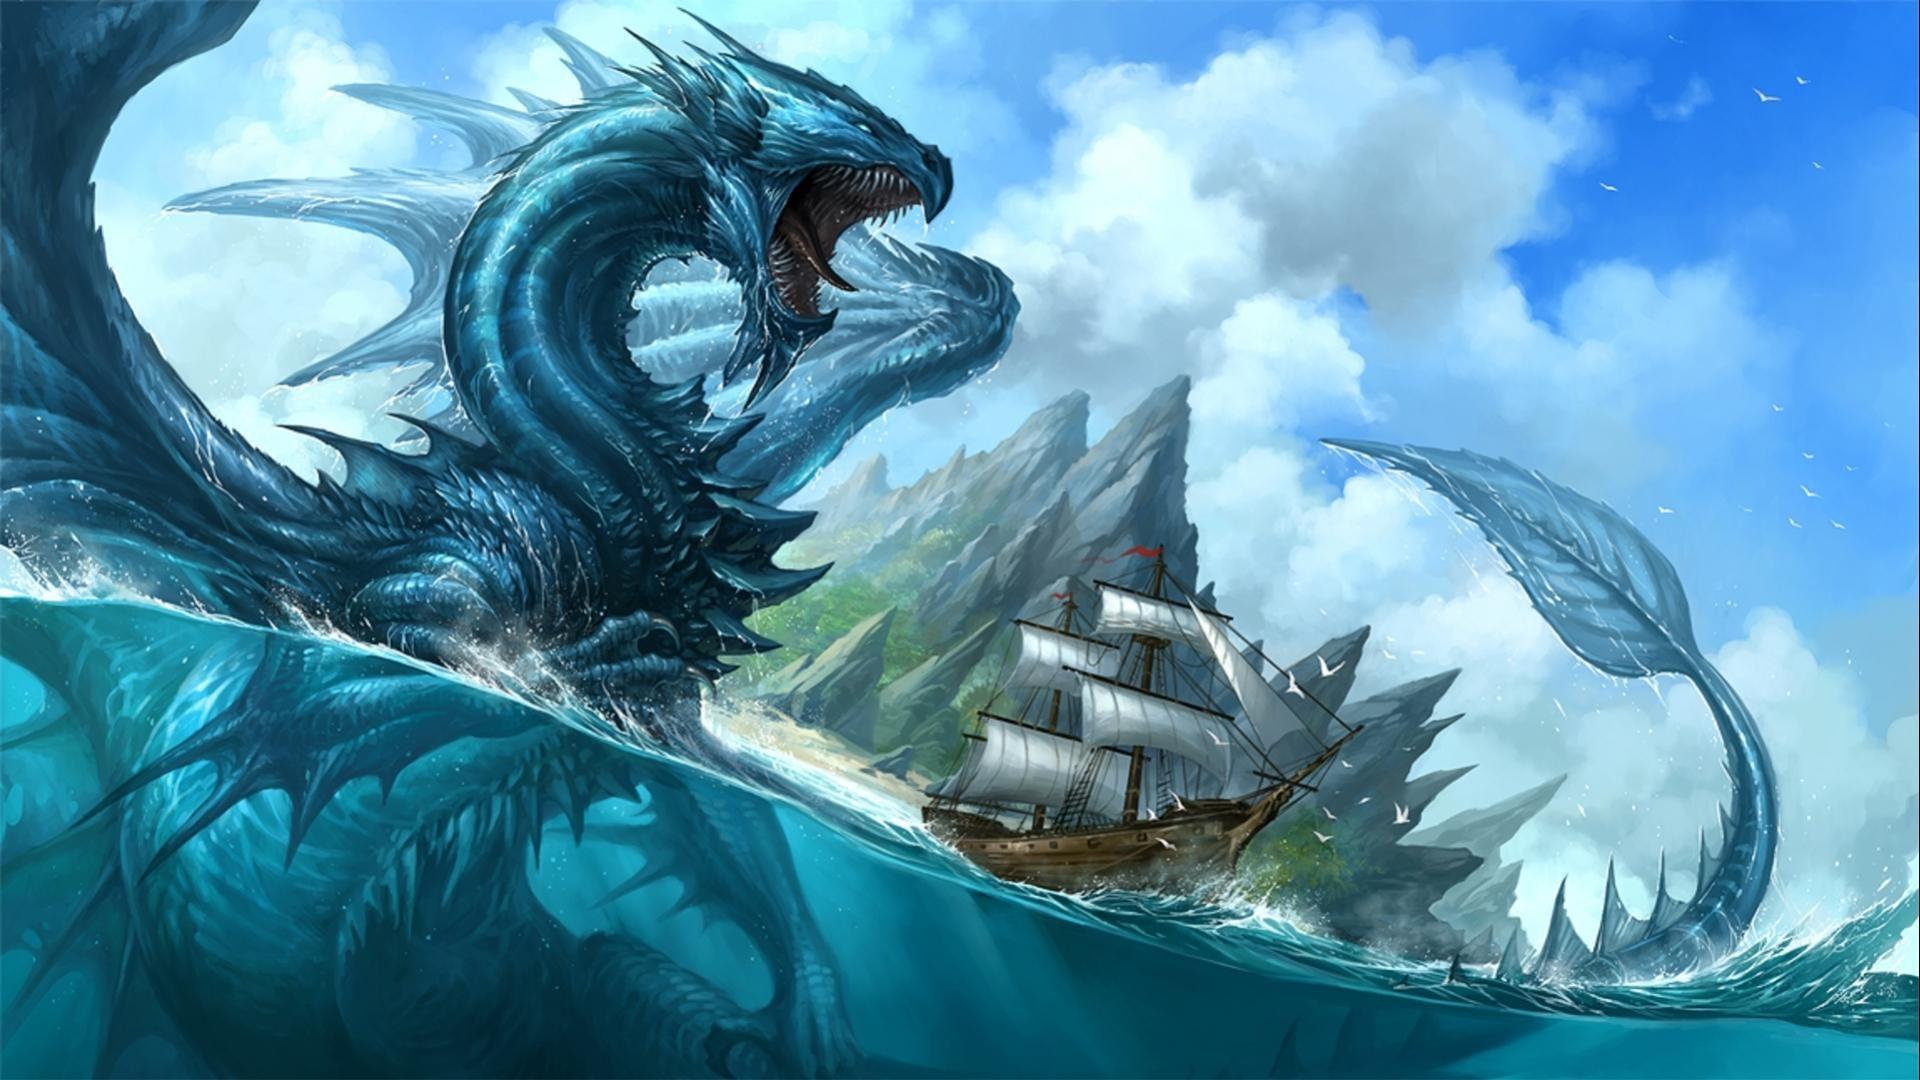 Aquaria, the Tide Watcher C401da3df399843abcf2c09925919752